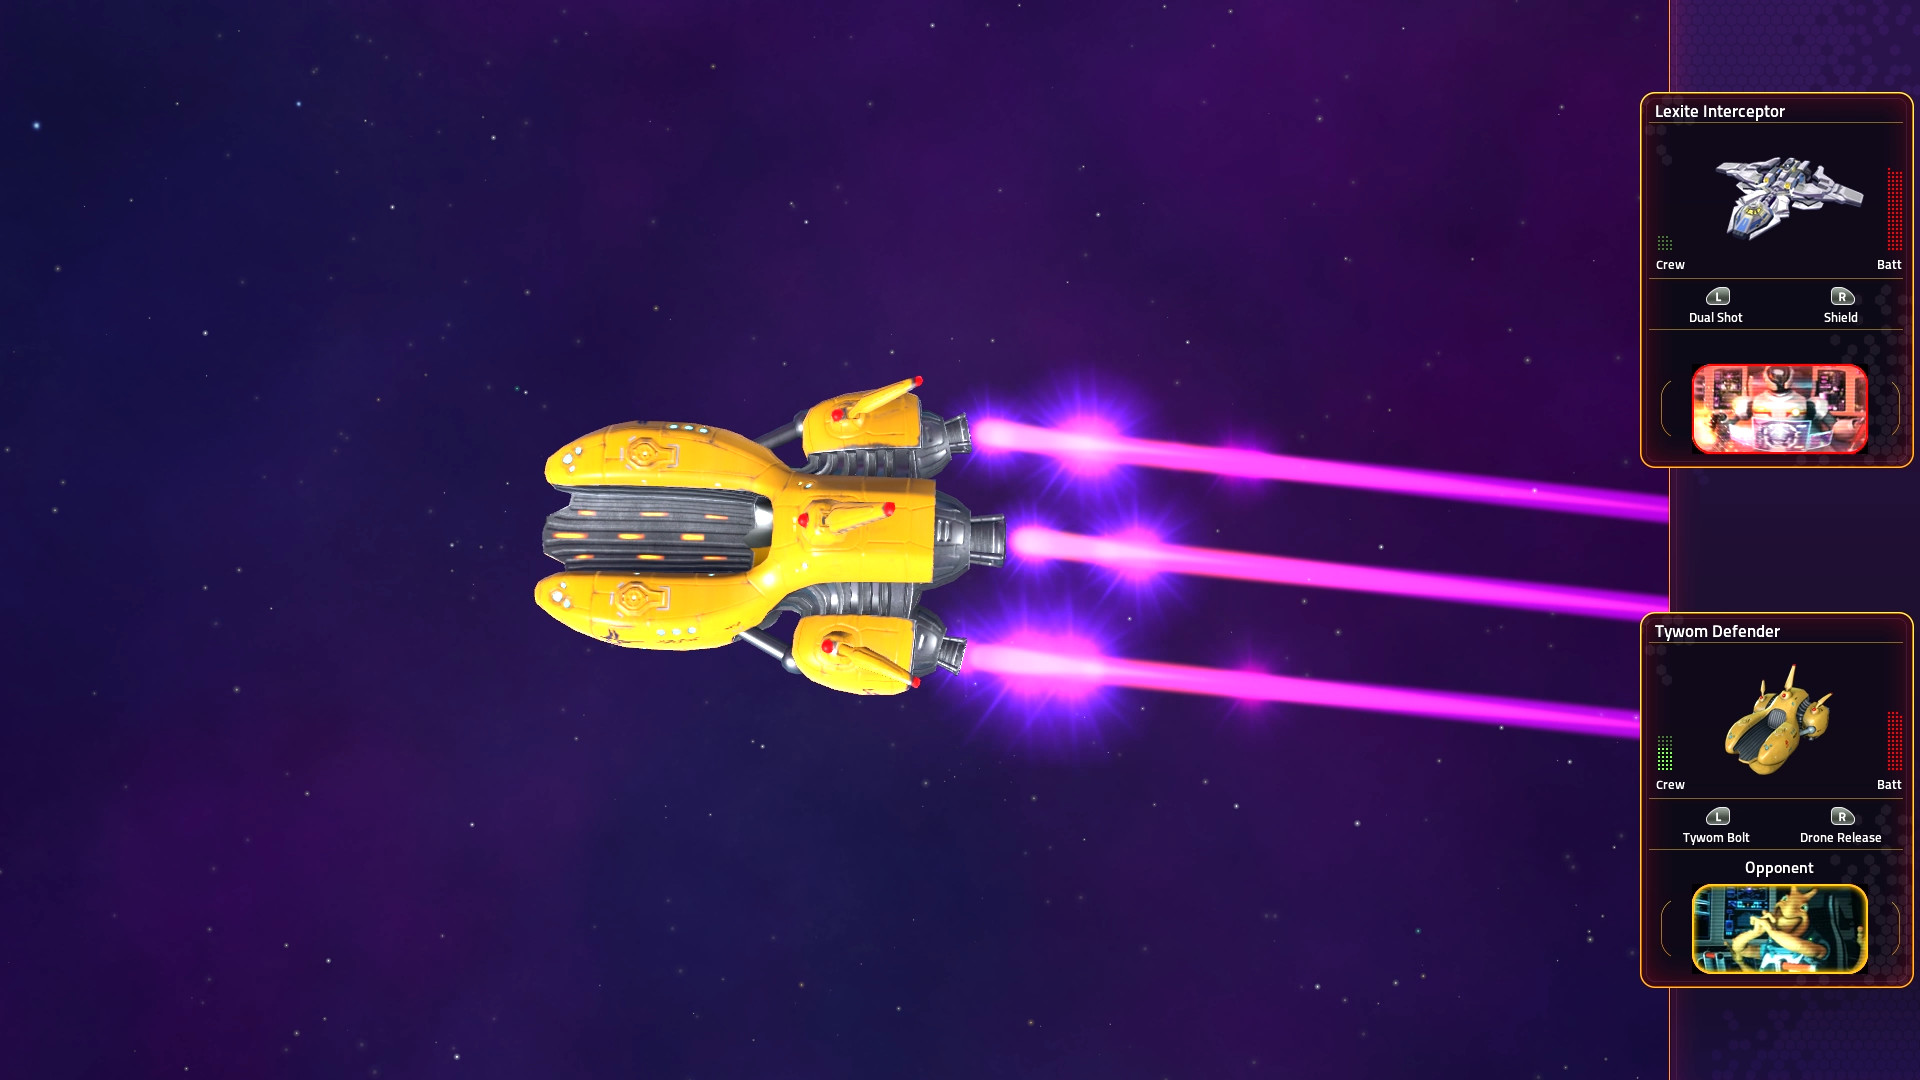 Star Control Origins Fleet Battles Beta 3 Introduces New